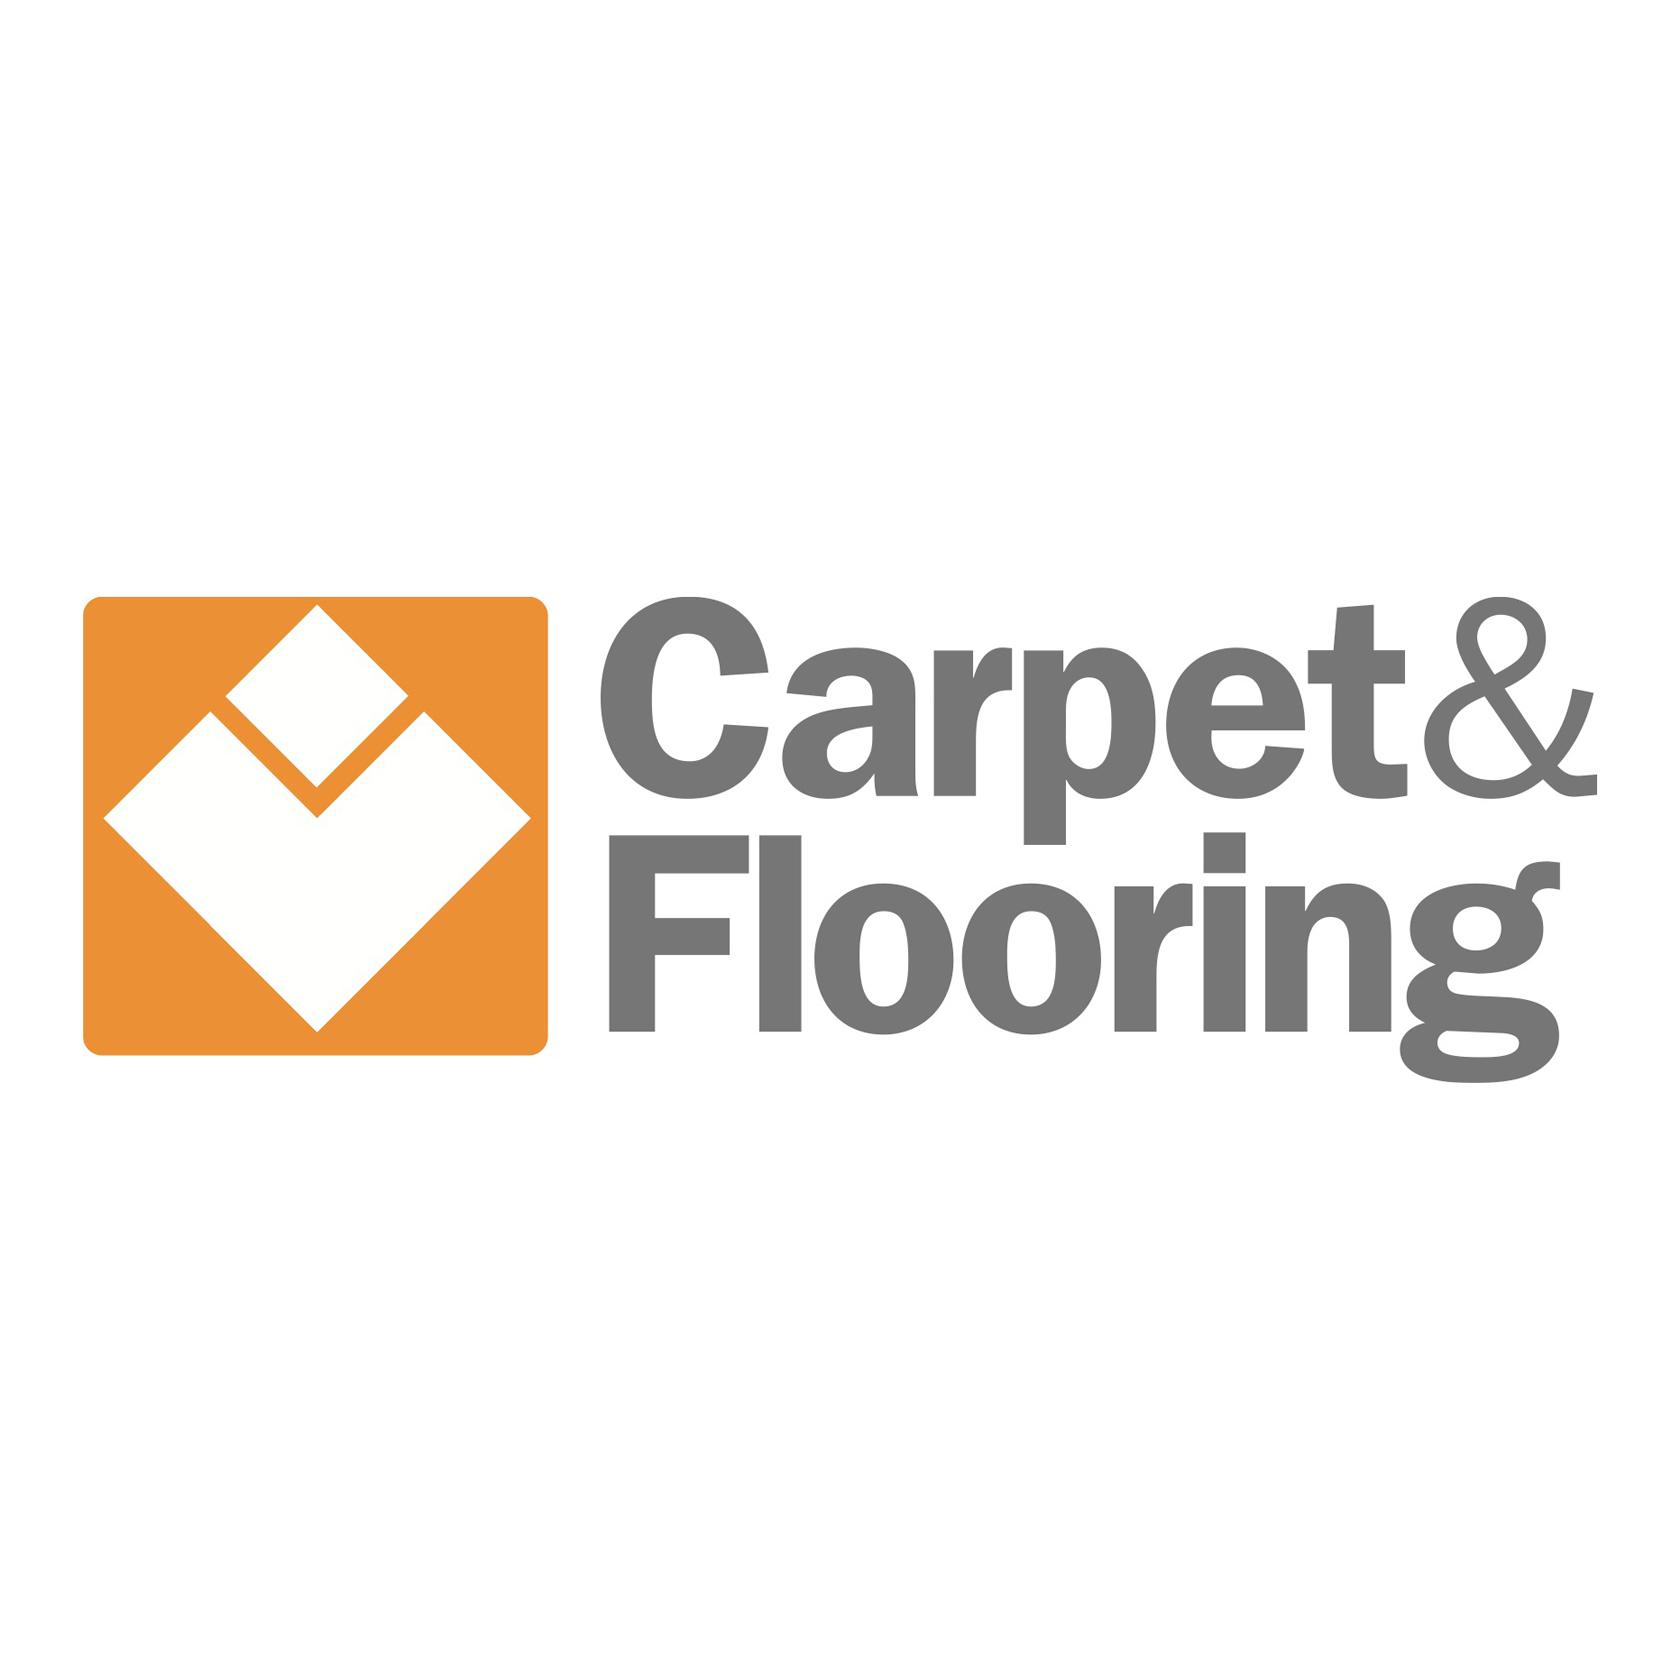 Carpet & Flooring Logo